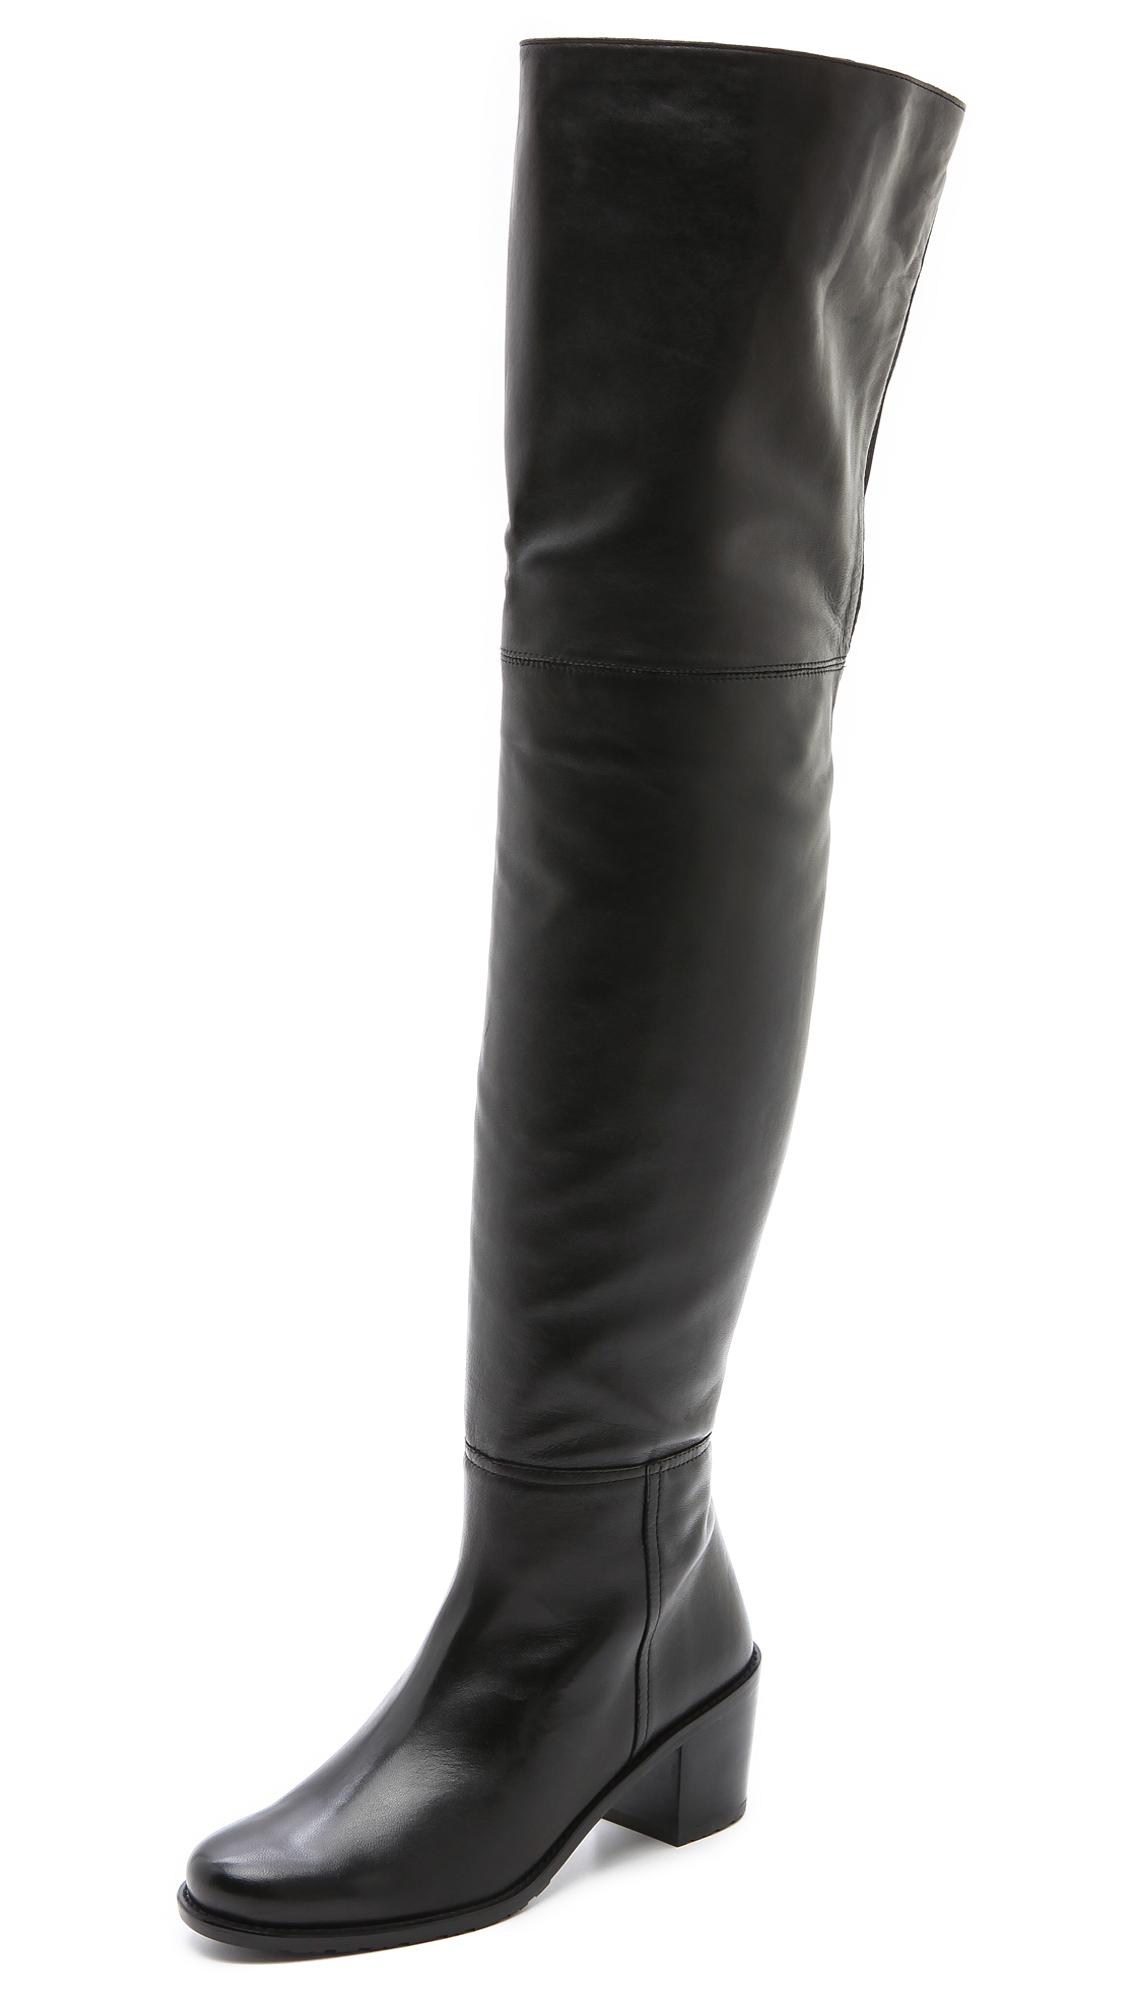 stuart weitzman the knee boots sale 28 images stuart weitzman the knee boots pyrite in gray. Black Bedroom Furniture Sets. Home Design Ideas